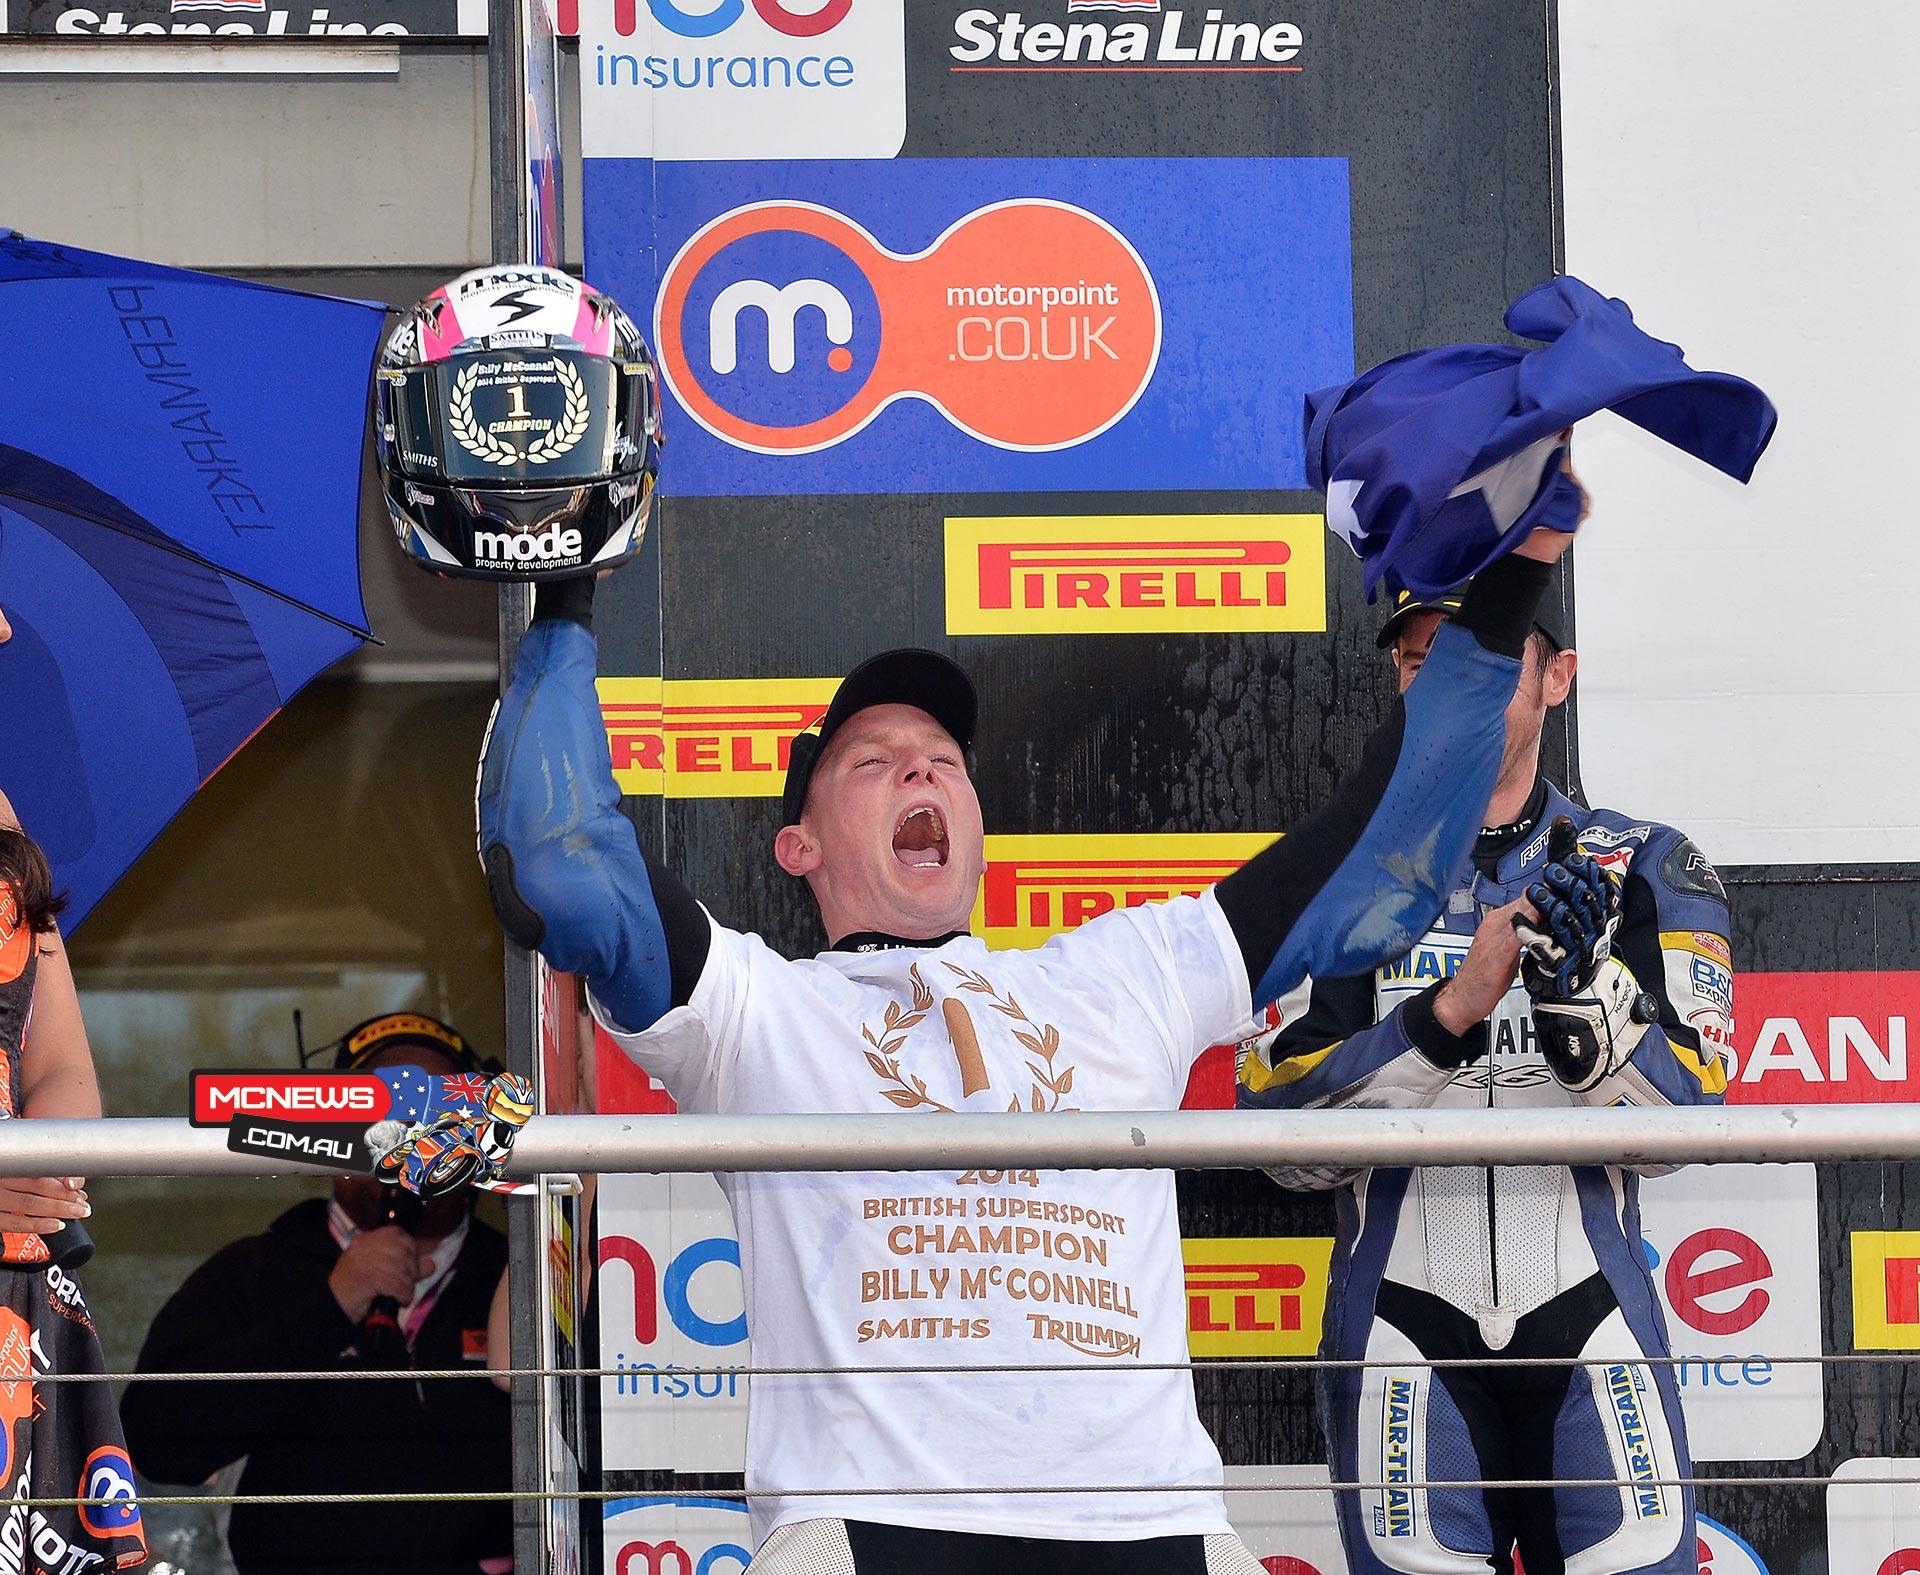 Billy McConnell 2014 British Supersport Champion